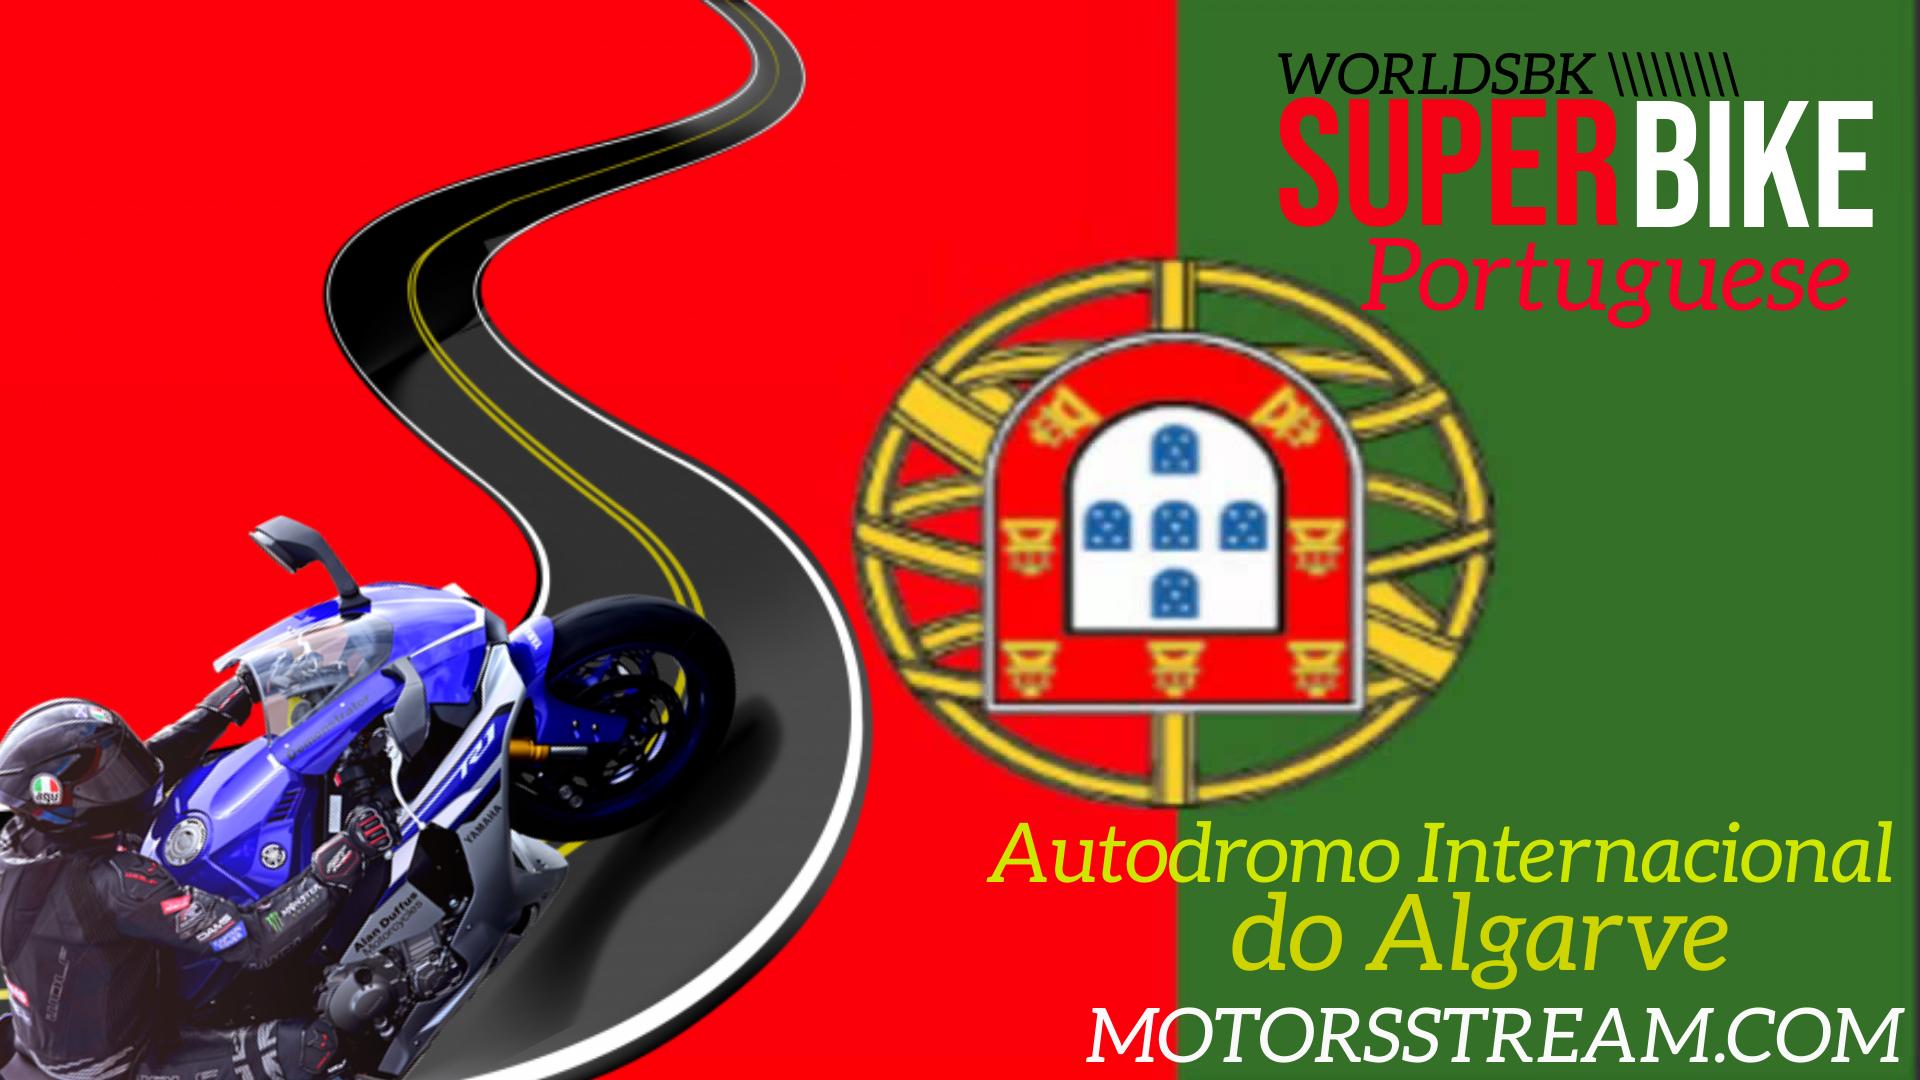 Portuguese WSBK Round 9 Live Stream 2021